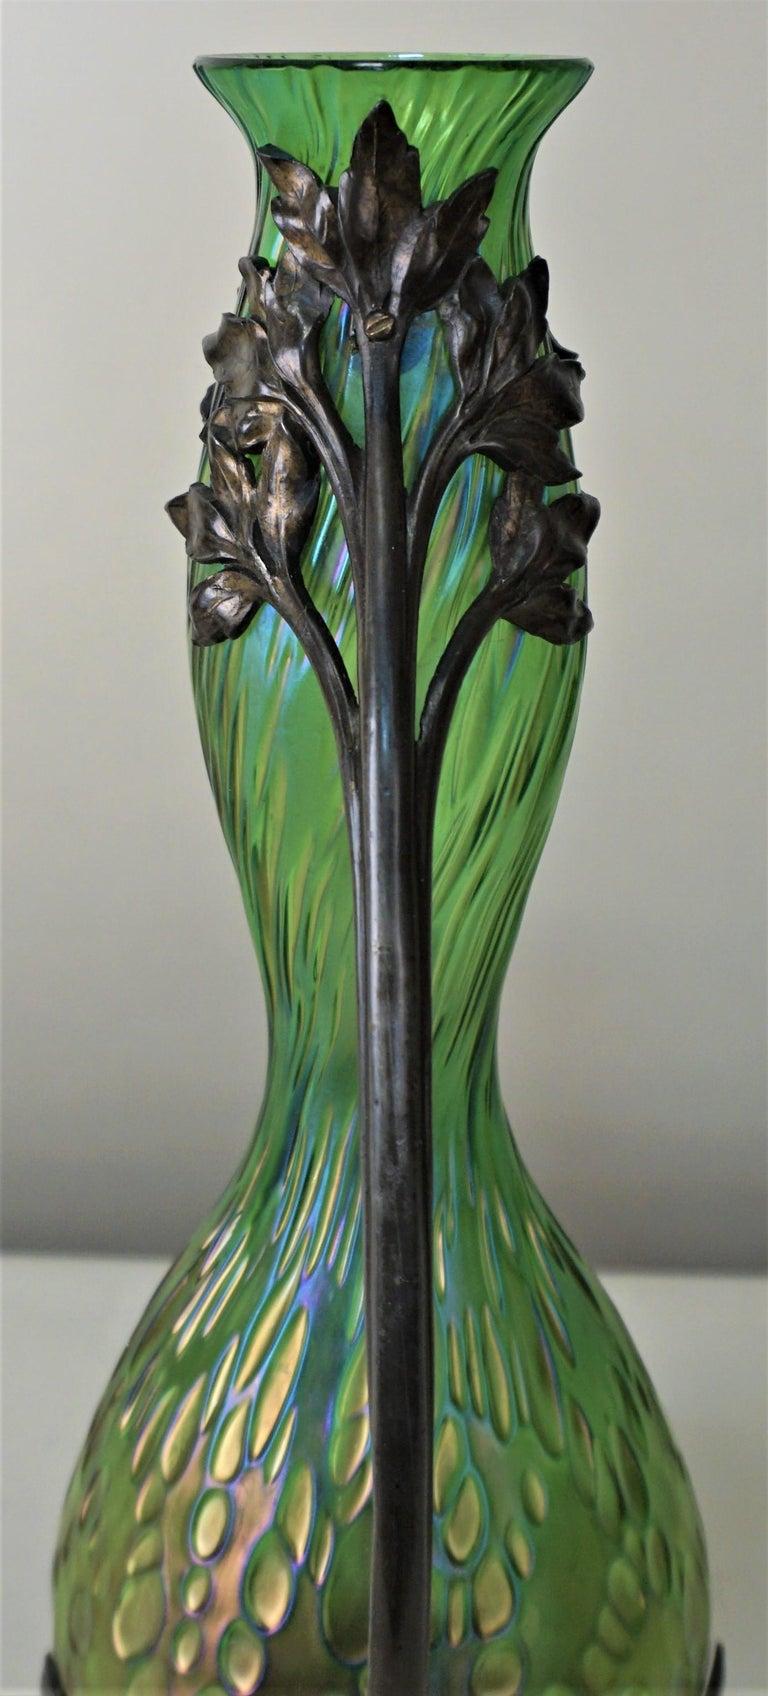 Early 20th Century Loetz Style Art Nouveau Glass Vase